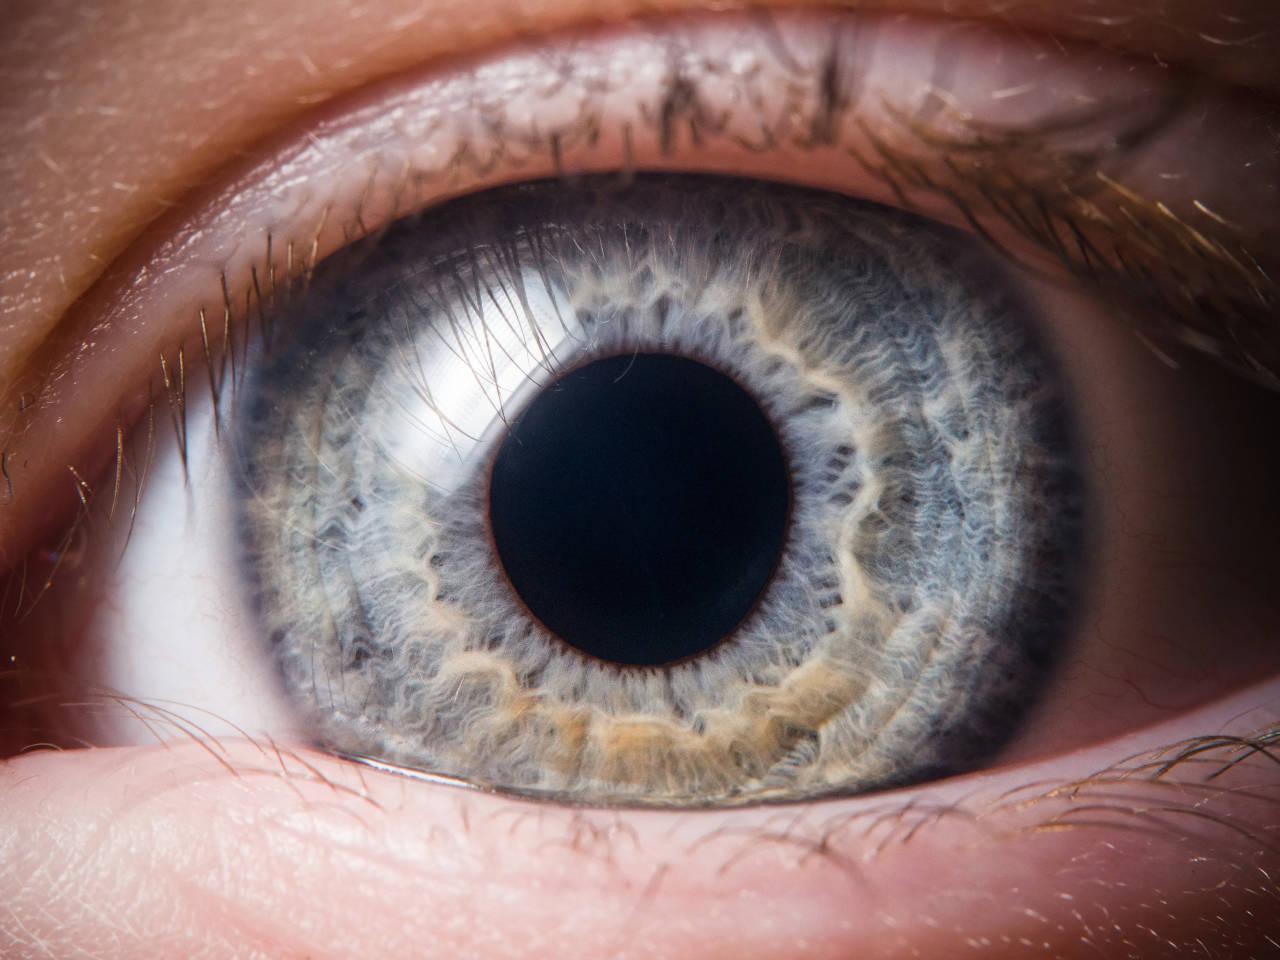 oštećena rožnica oka, ogrebotina roznice